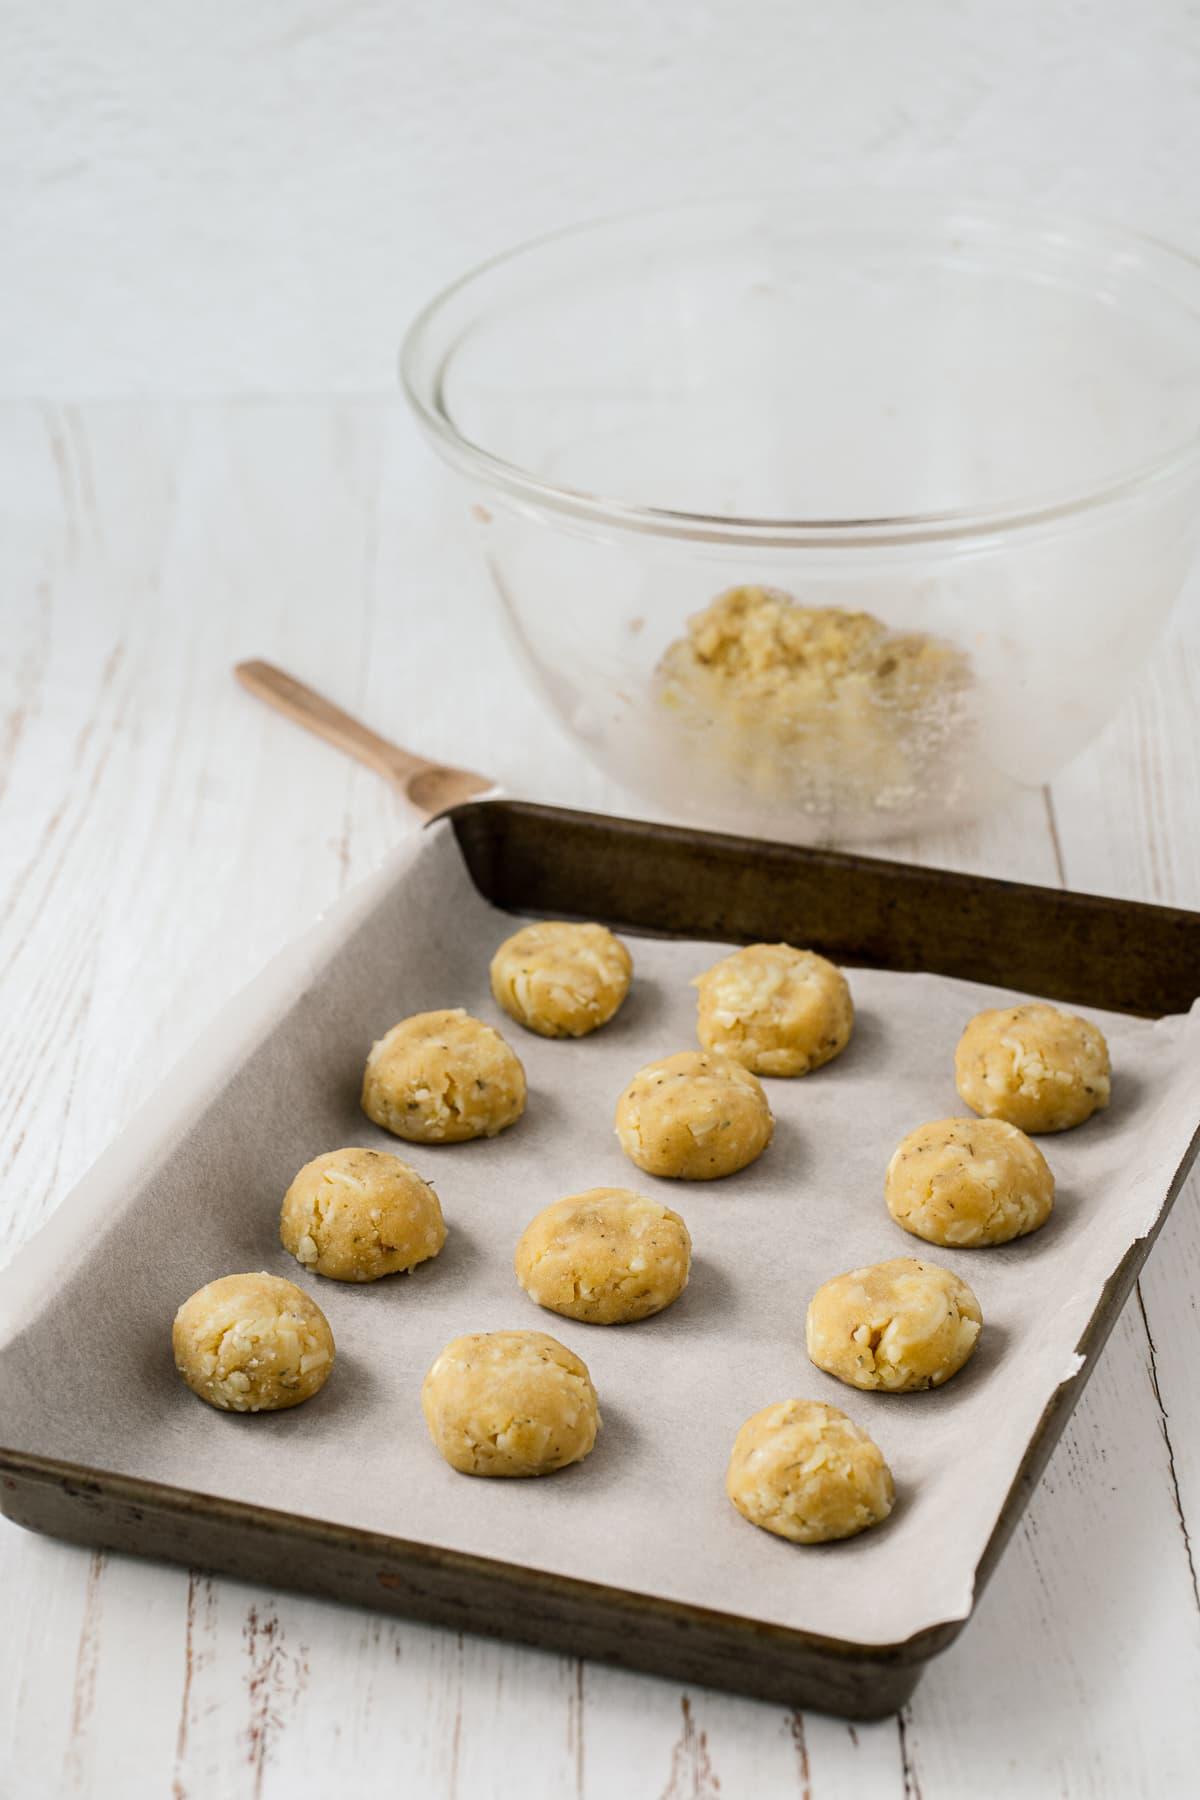 almond flour buns